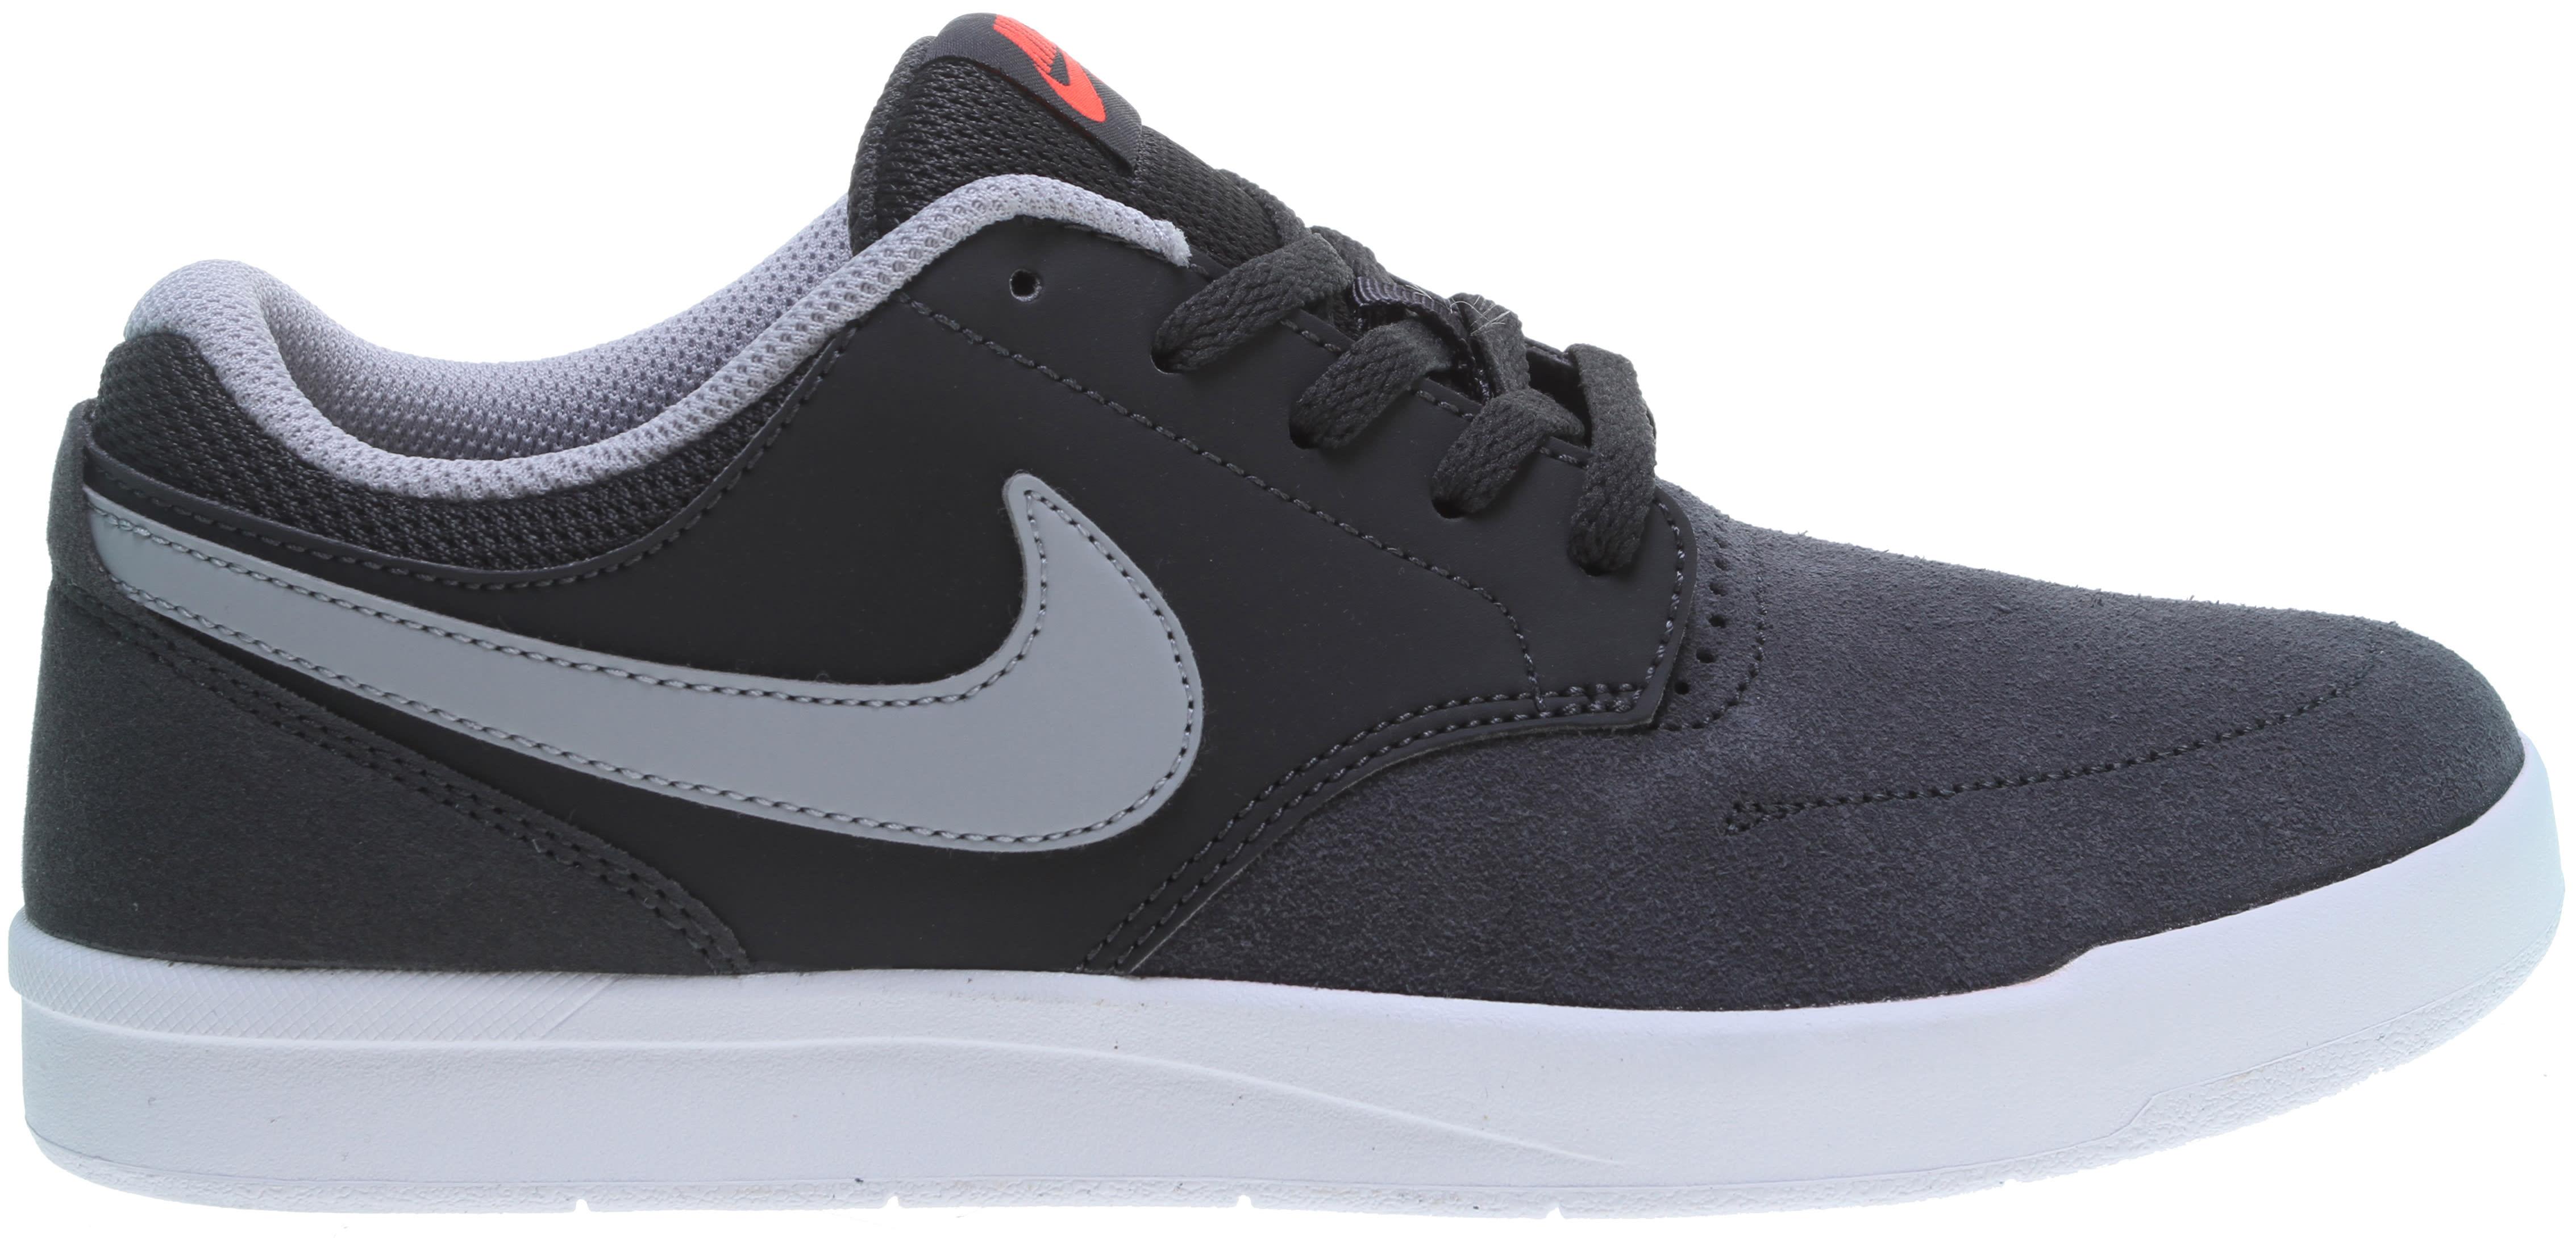 41e32a233ef51e Nike SB Fokus (GS) Skate Shoes - thumbnail 1